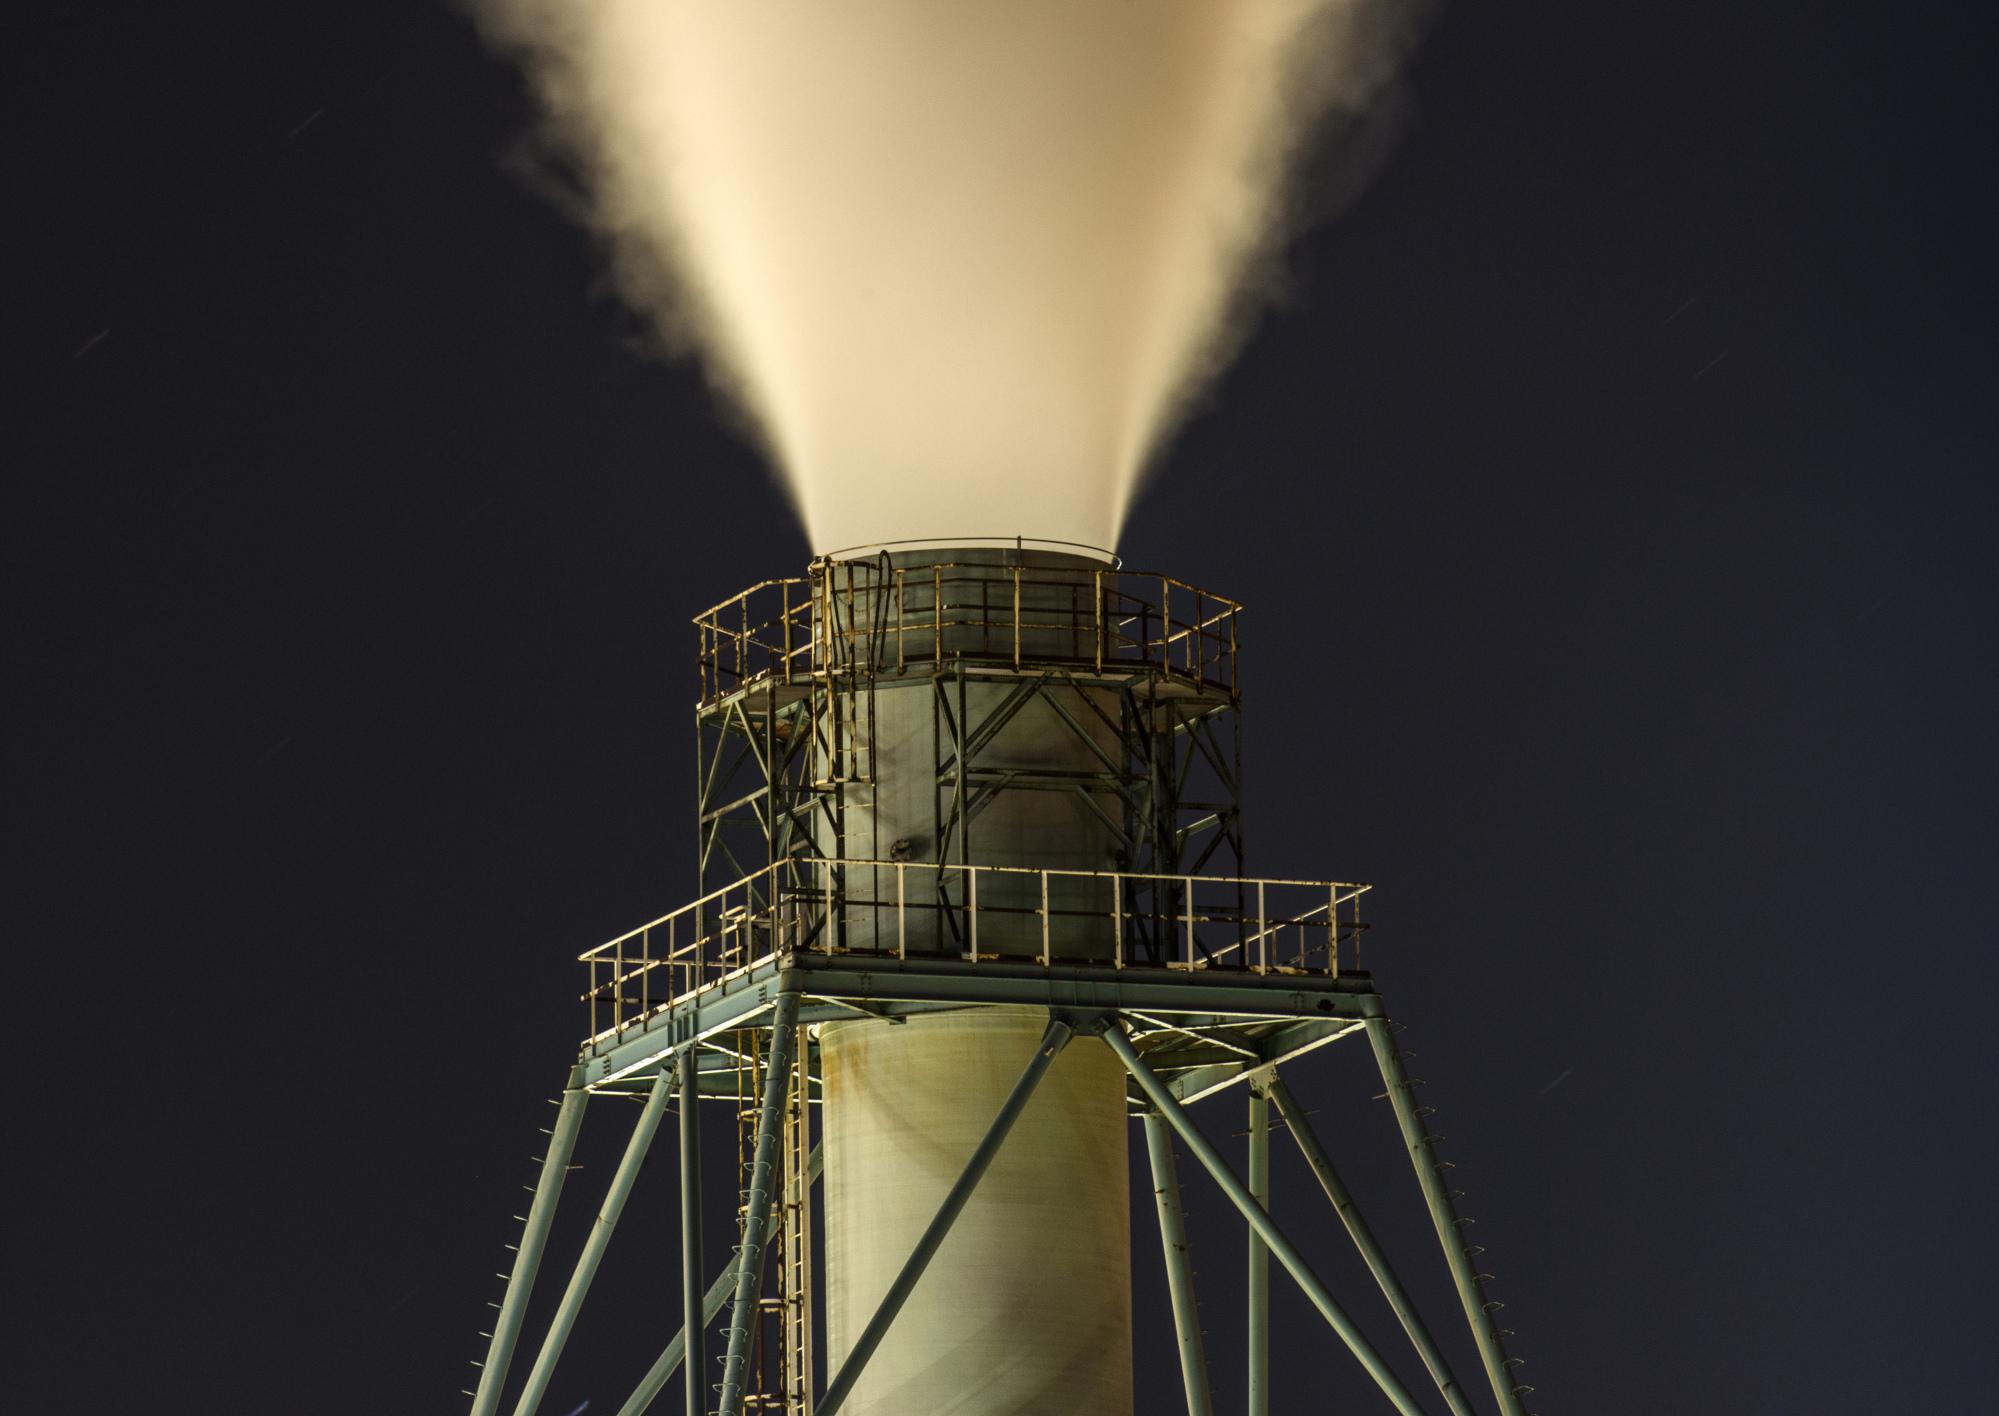 Night Views Of JXTG Nippon Oil & Energy Corp. Muroran Petrochemical Plant